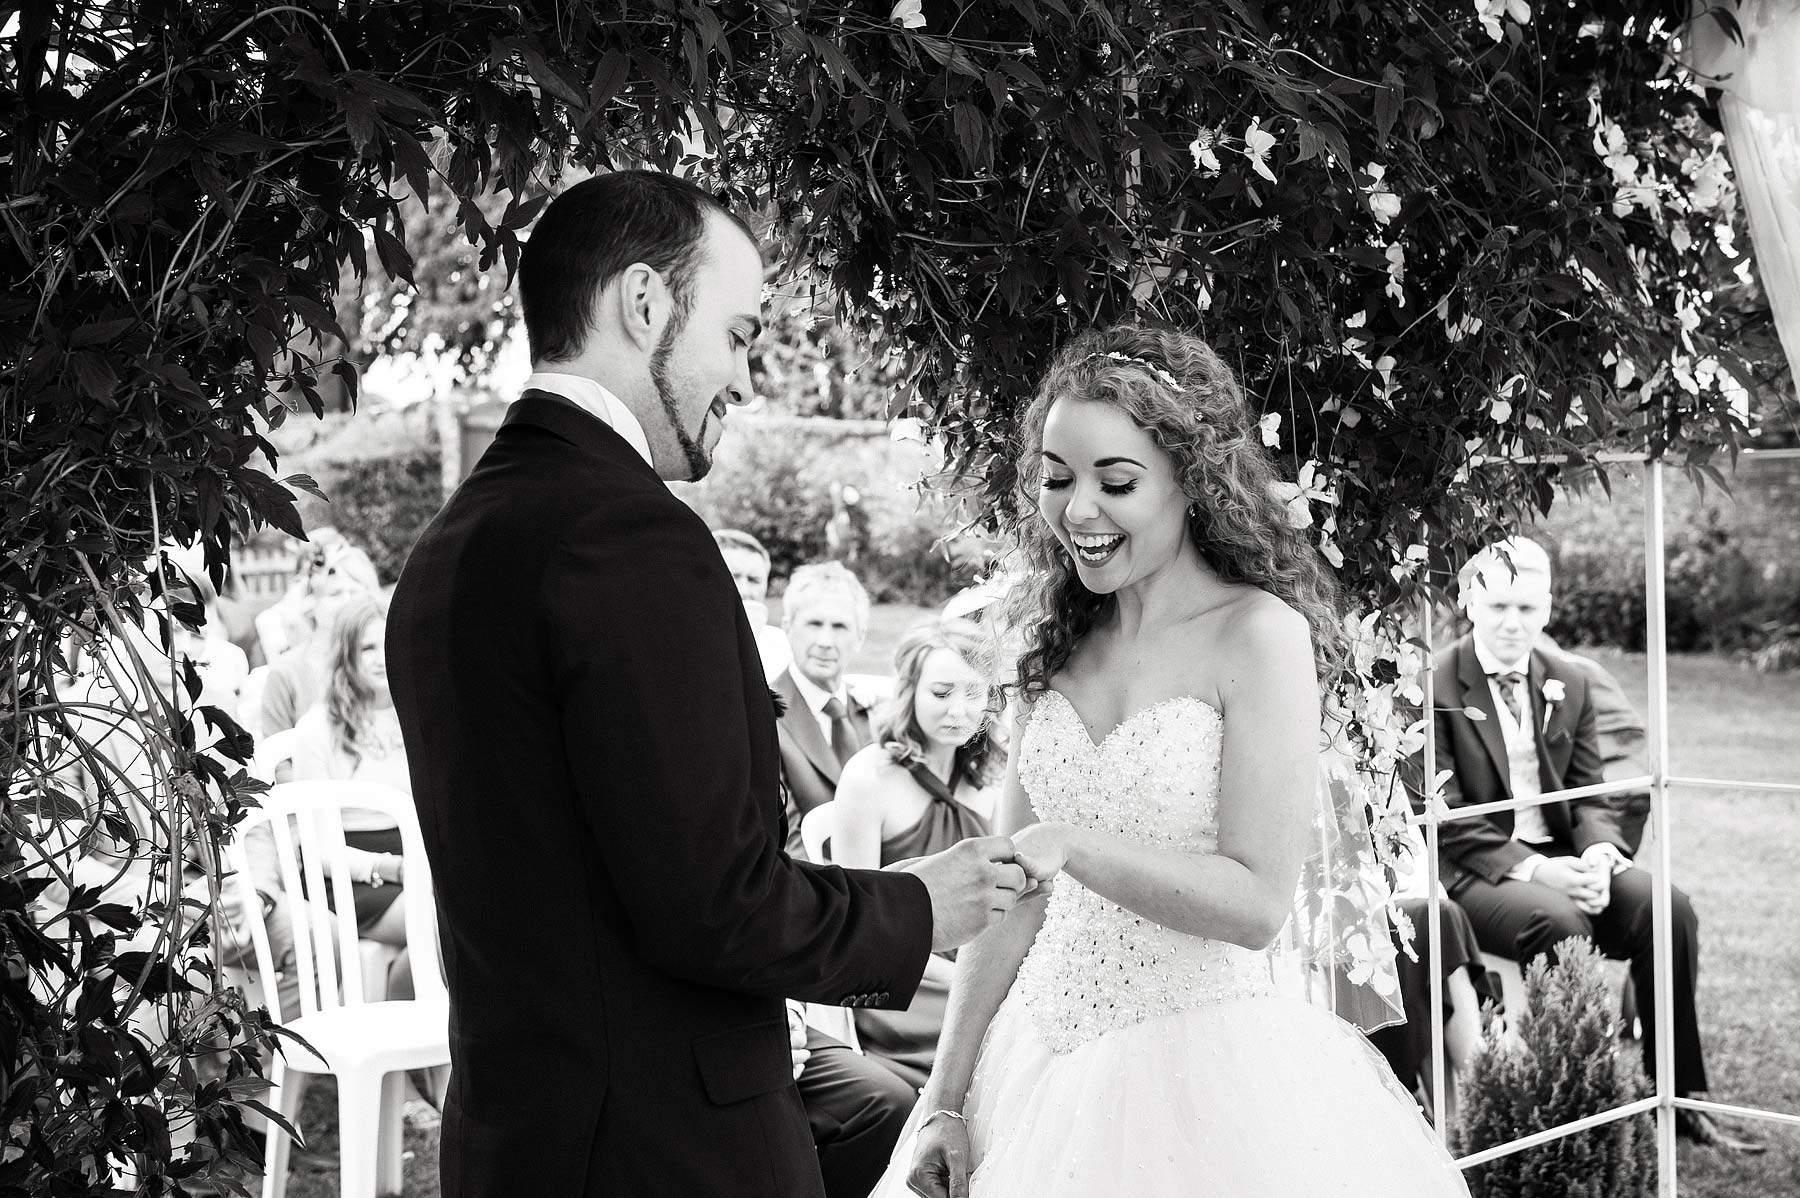 albright-hussey-manor-wedding-photographers-029